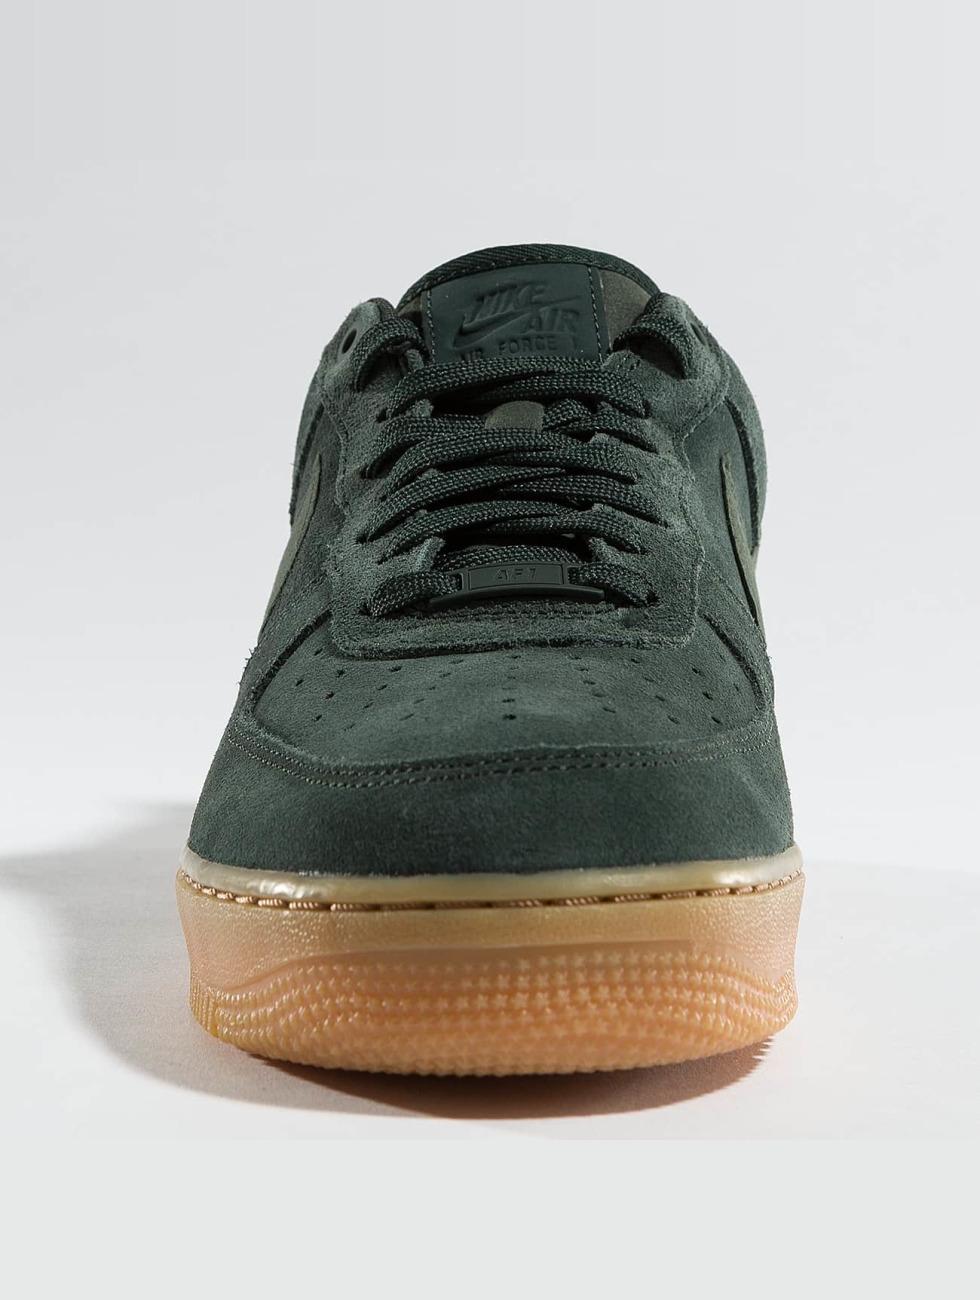 Nike Scarpa / Sneaker Air Force 1 '07 Lv8 In Camoscio Verde 375998 u0IaXK8d